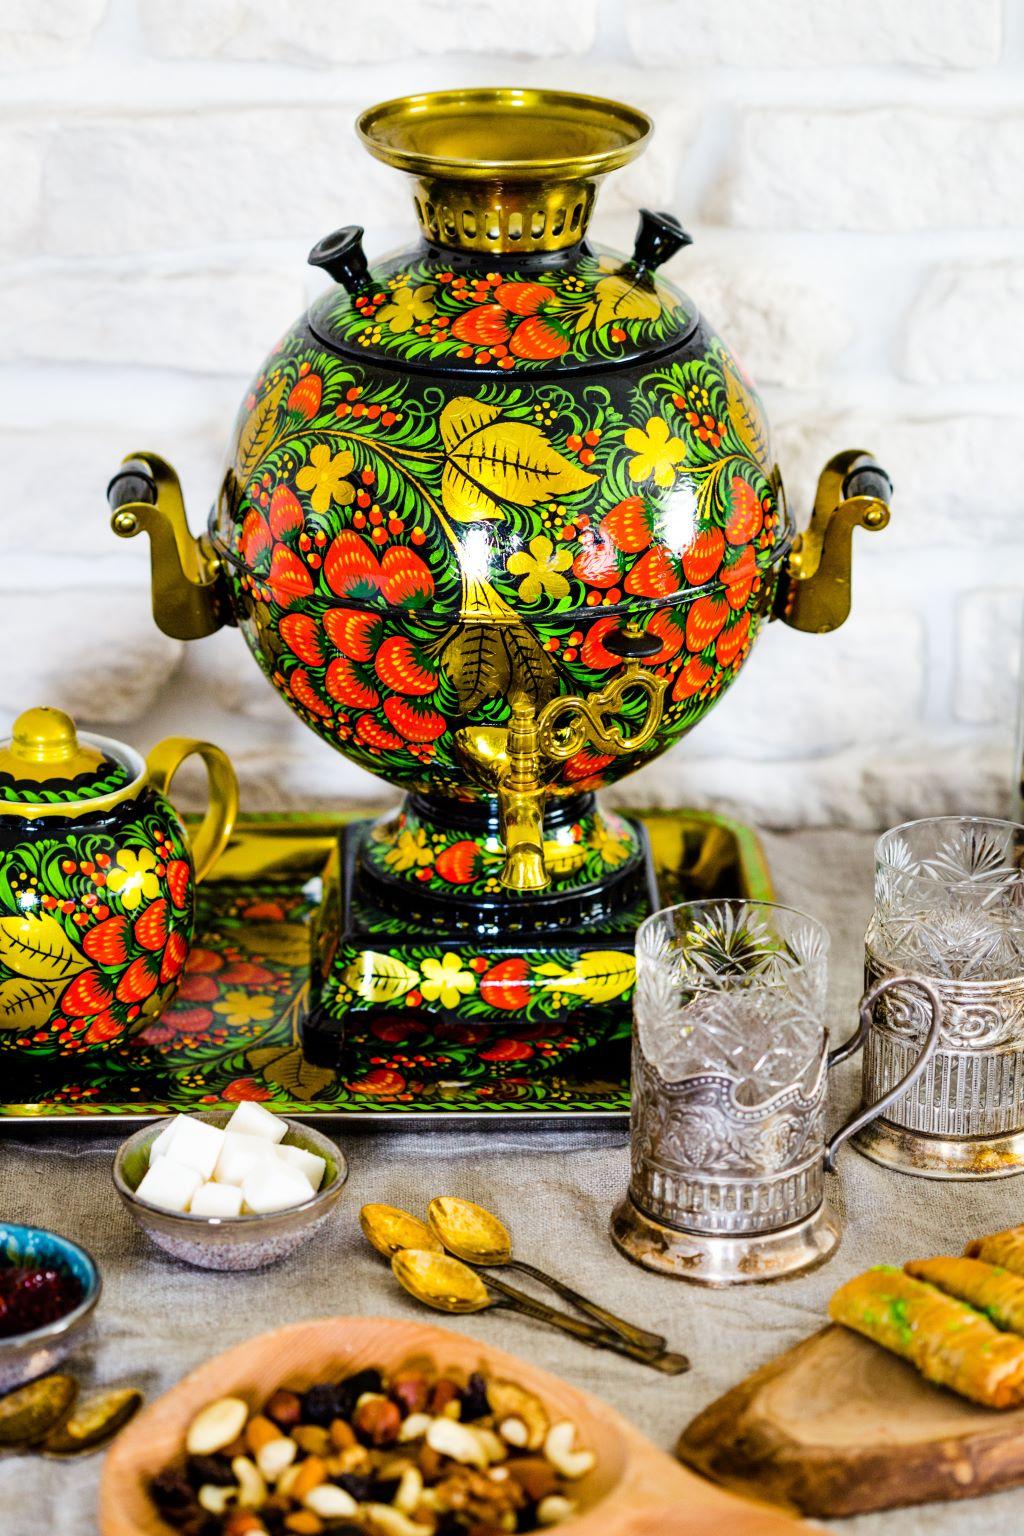 Casette Russe Di Campagna in russia il tè è una cosa seria! | mastro matrioska